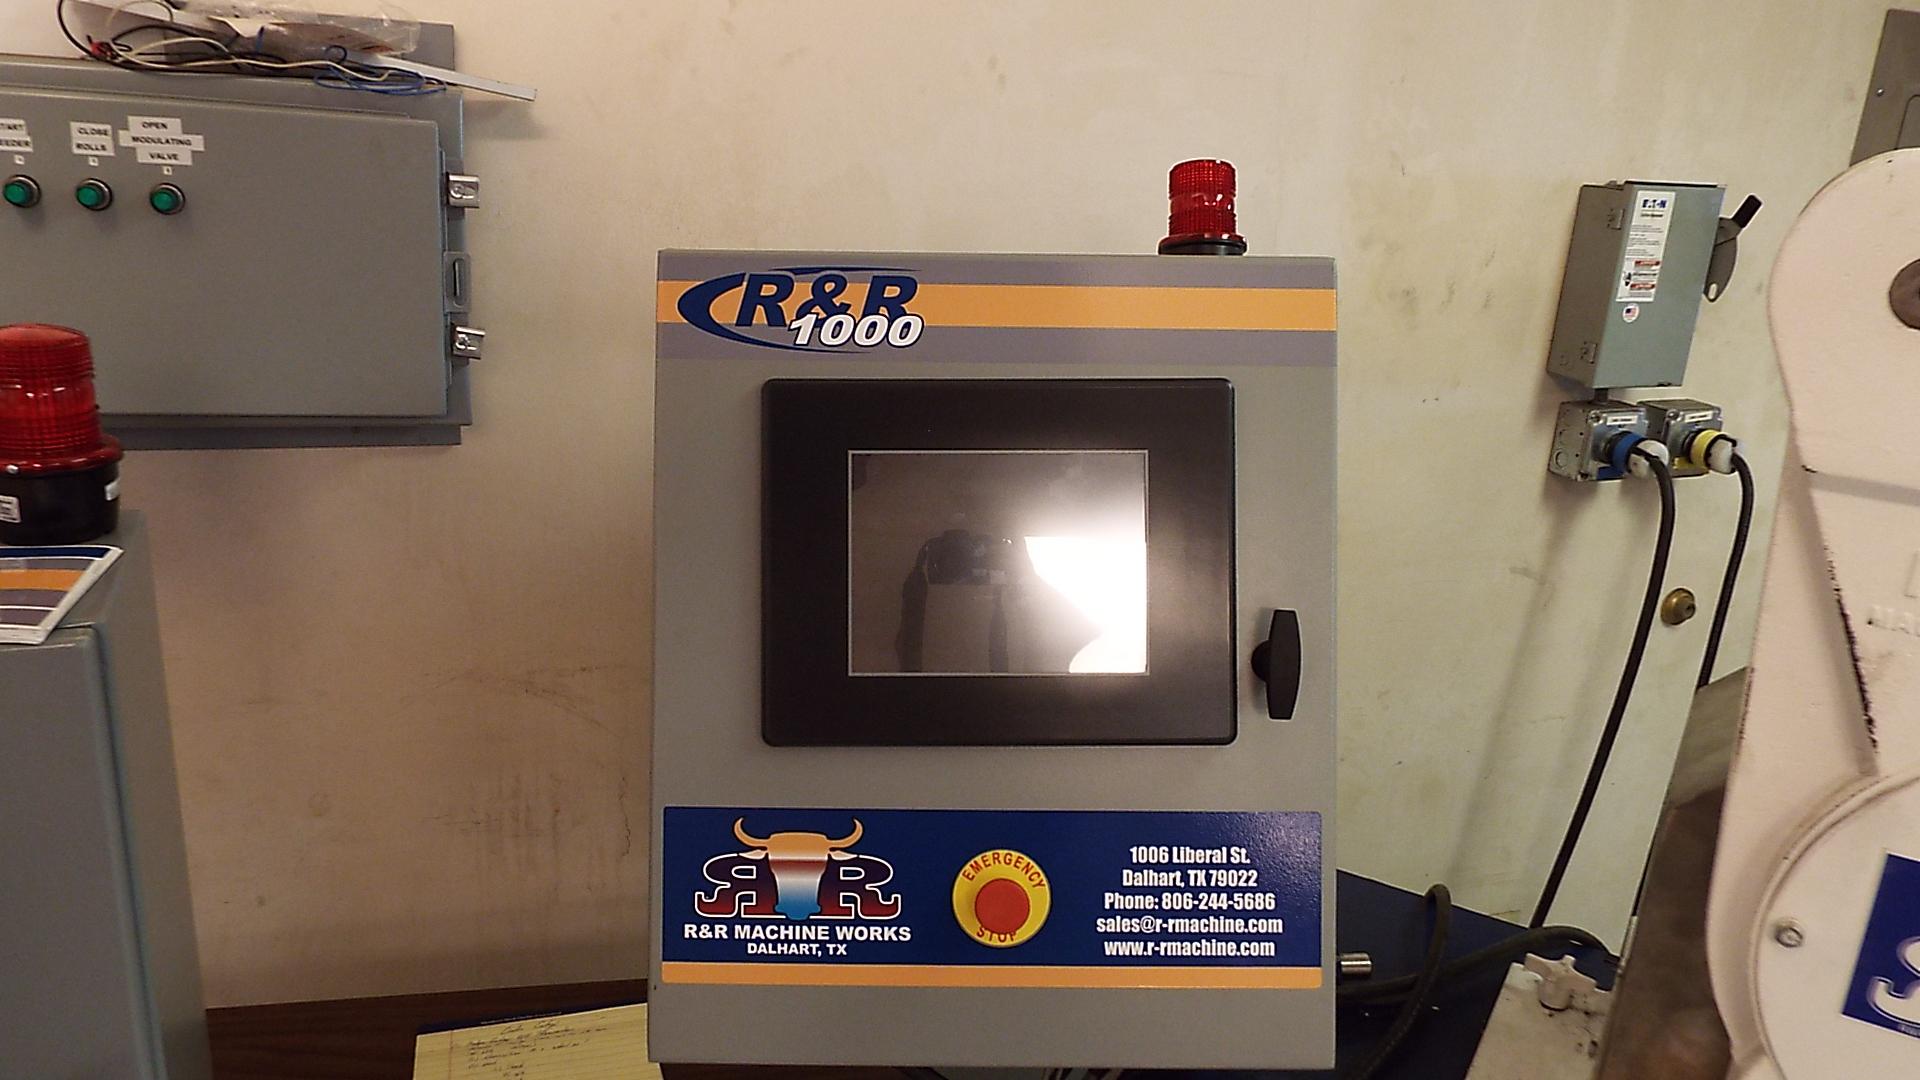 R&R Machine Works Automation